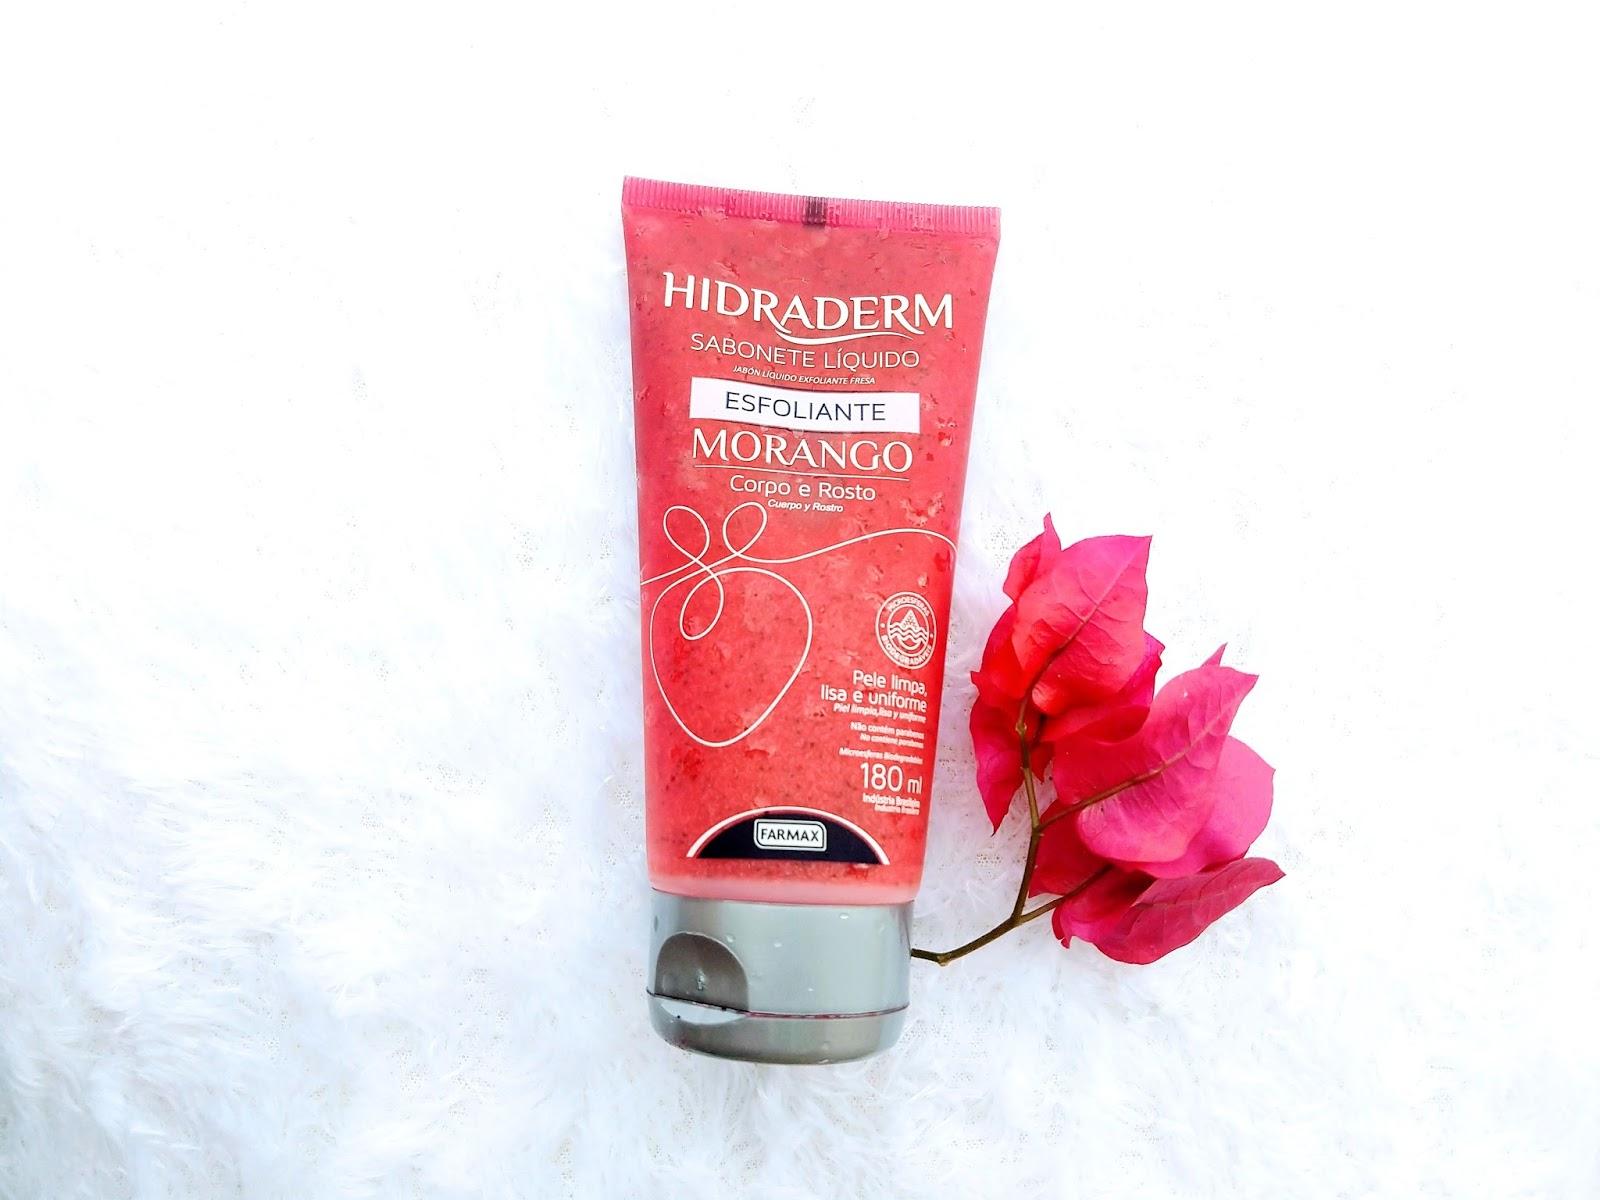 sabonete esfoliante farmax hidraderm